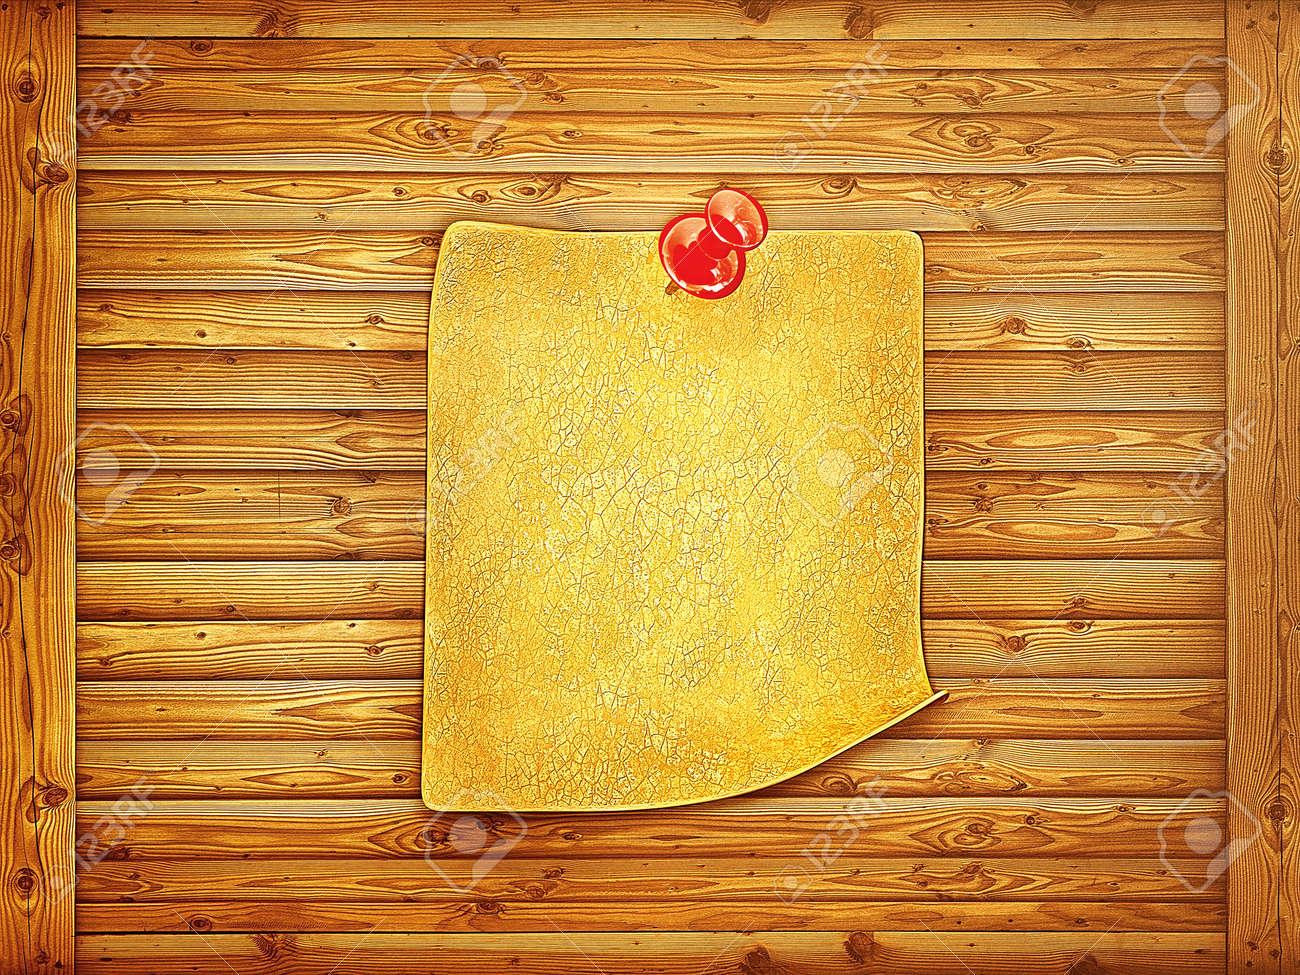 grunge paper sticker on a wooden background Stock Photo - 14303829